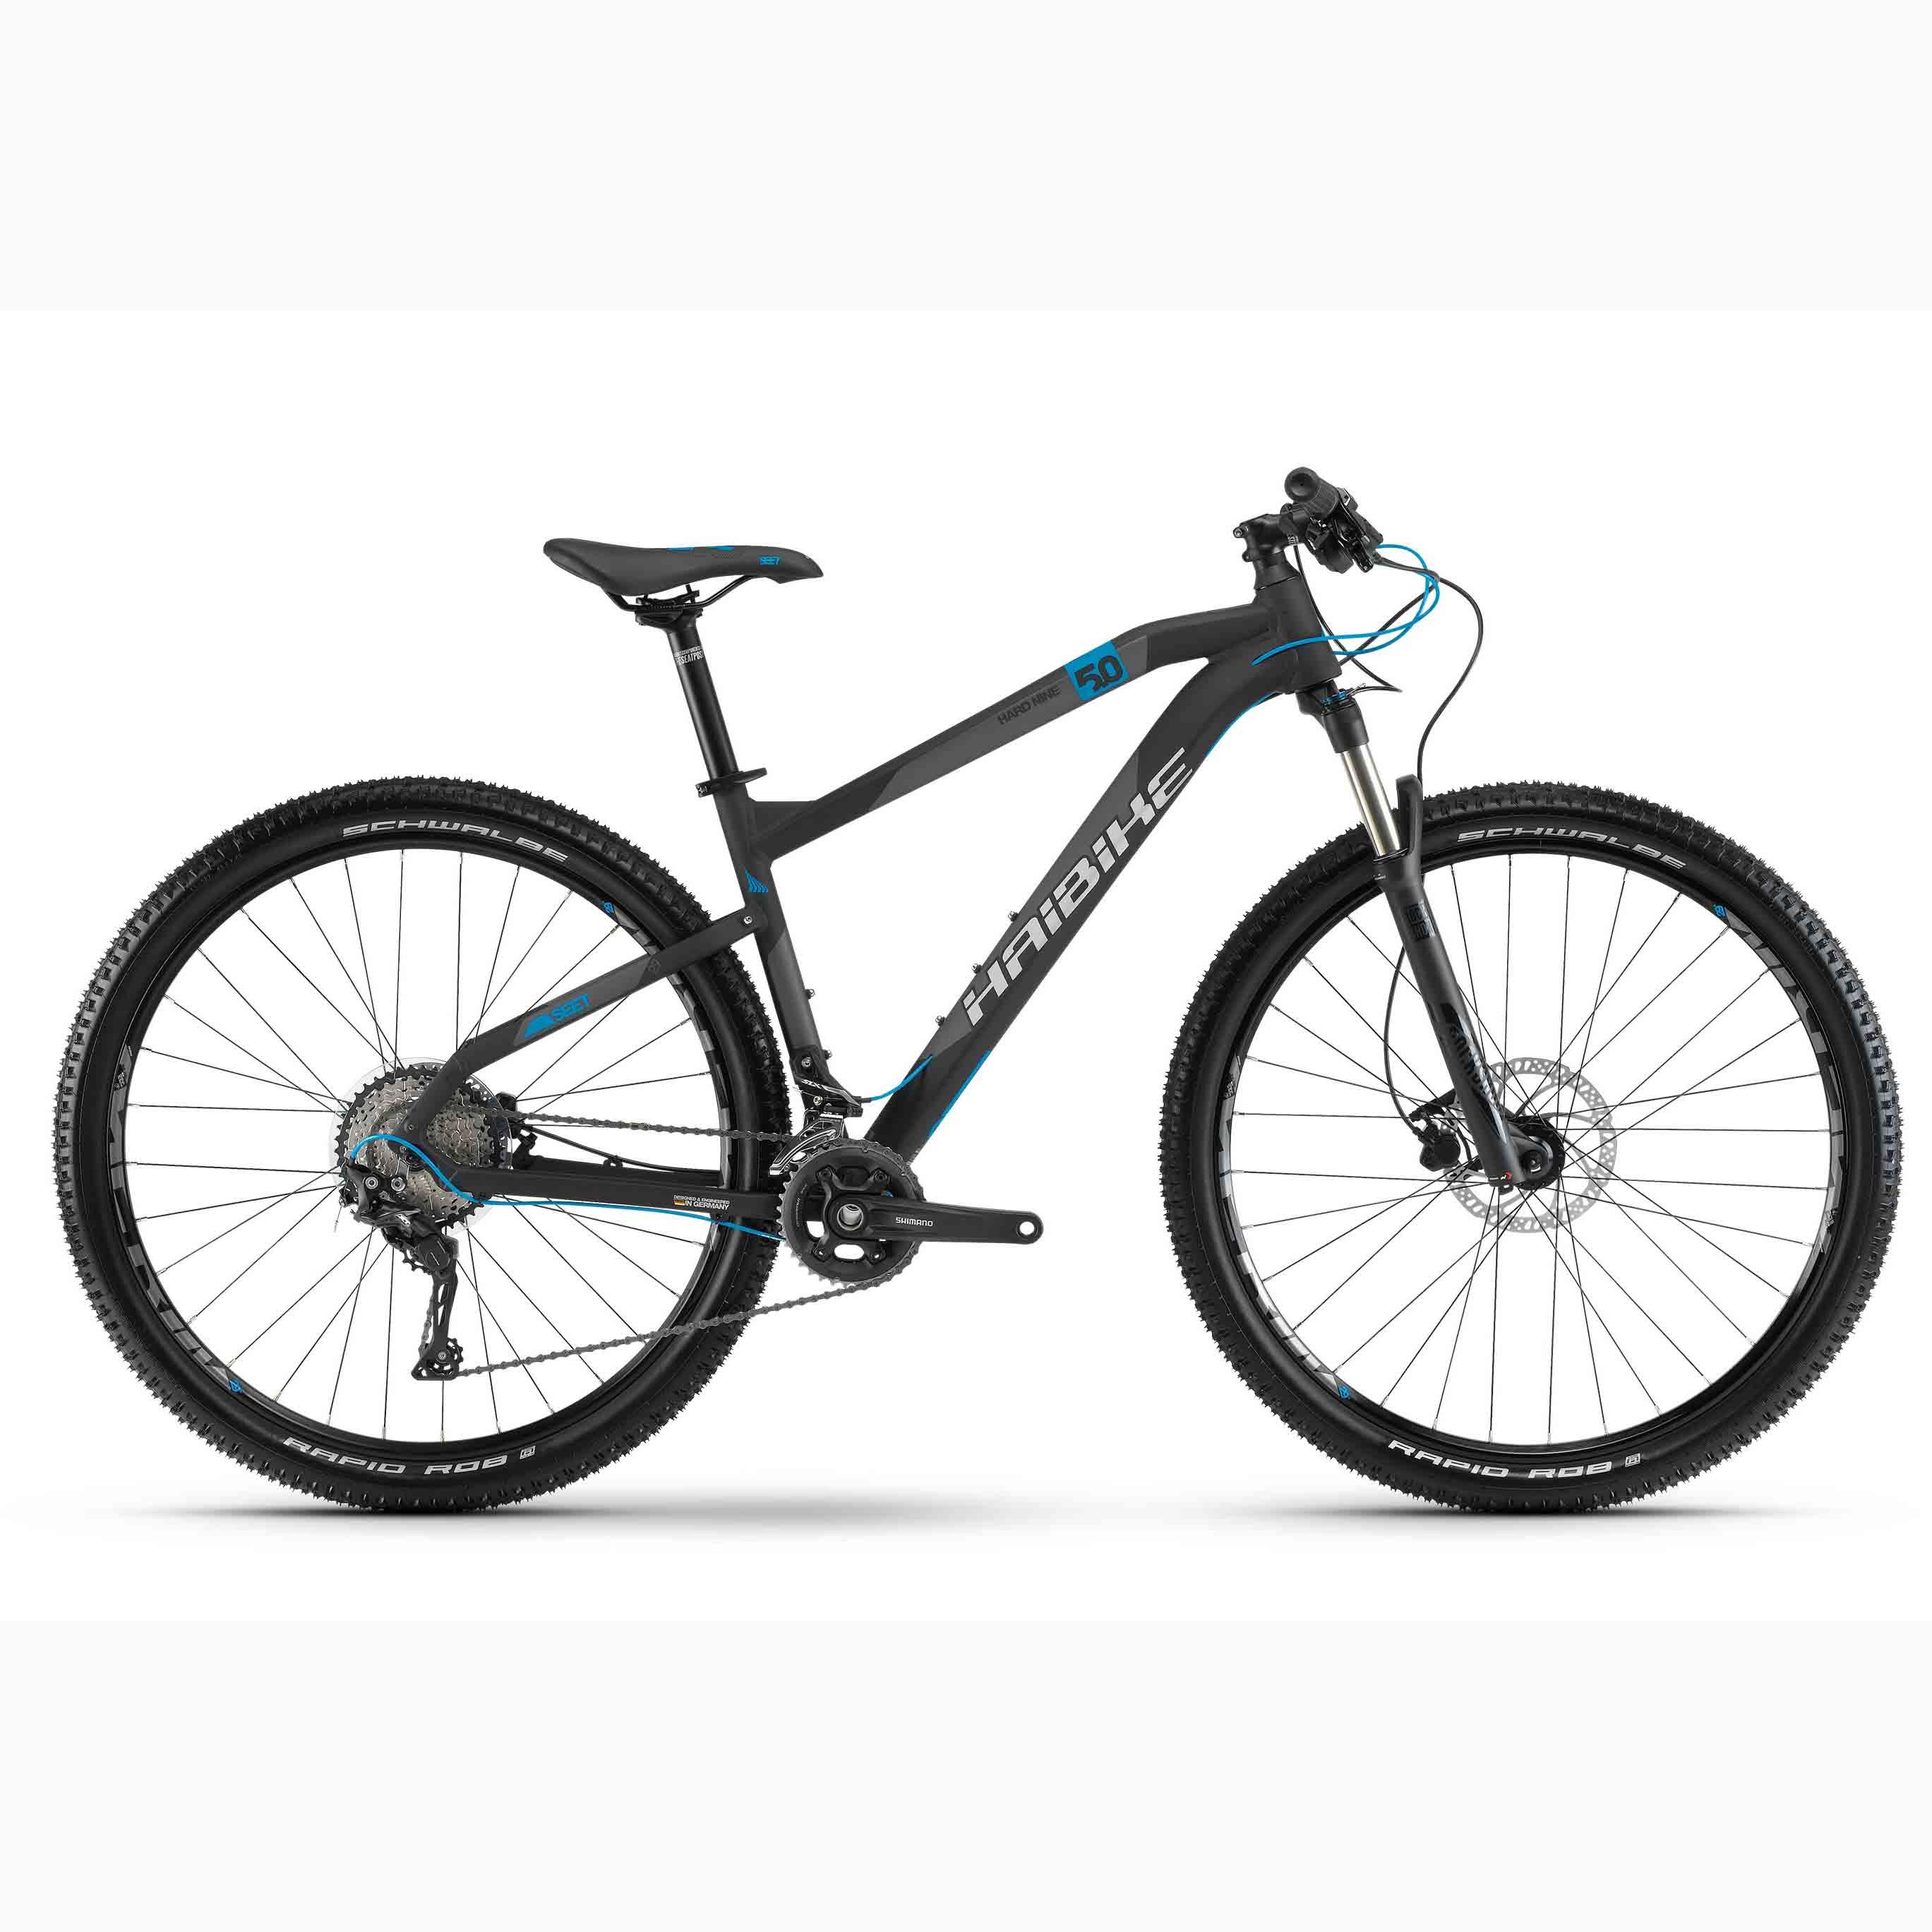 Фото Велосипед Haibike SEET HardNine 5.0 29″, рама 45см, 2018